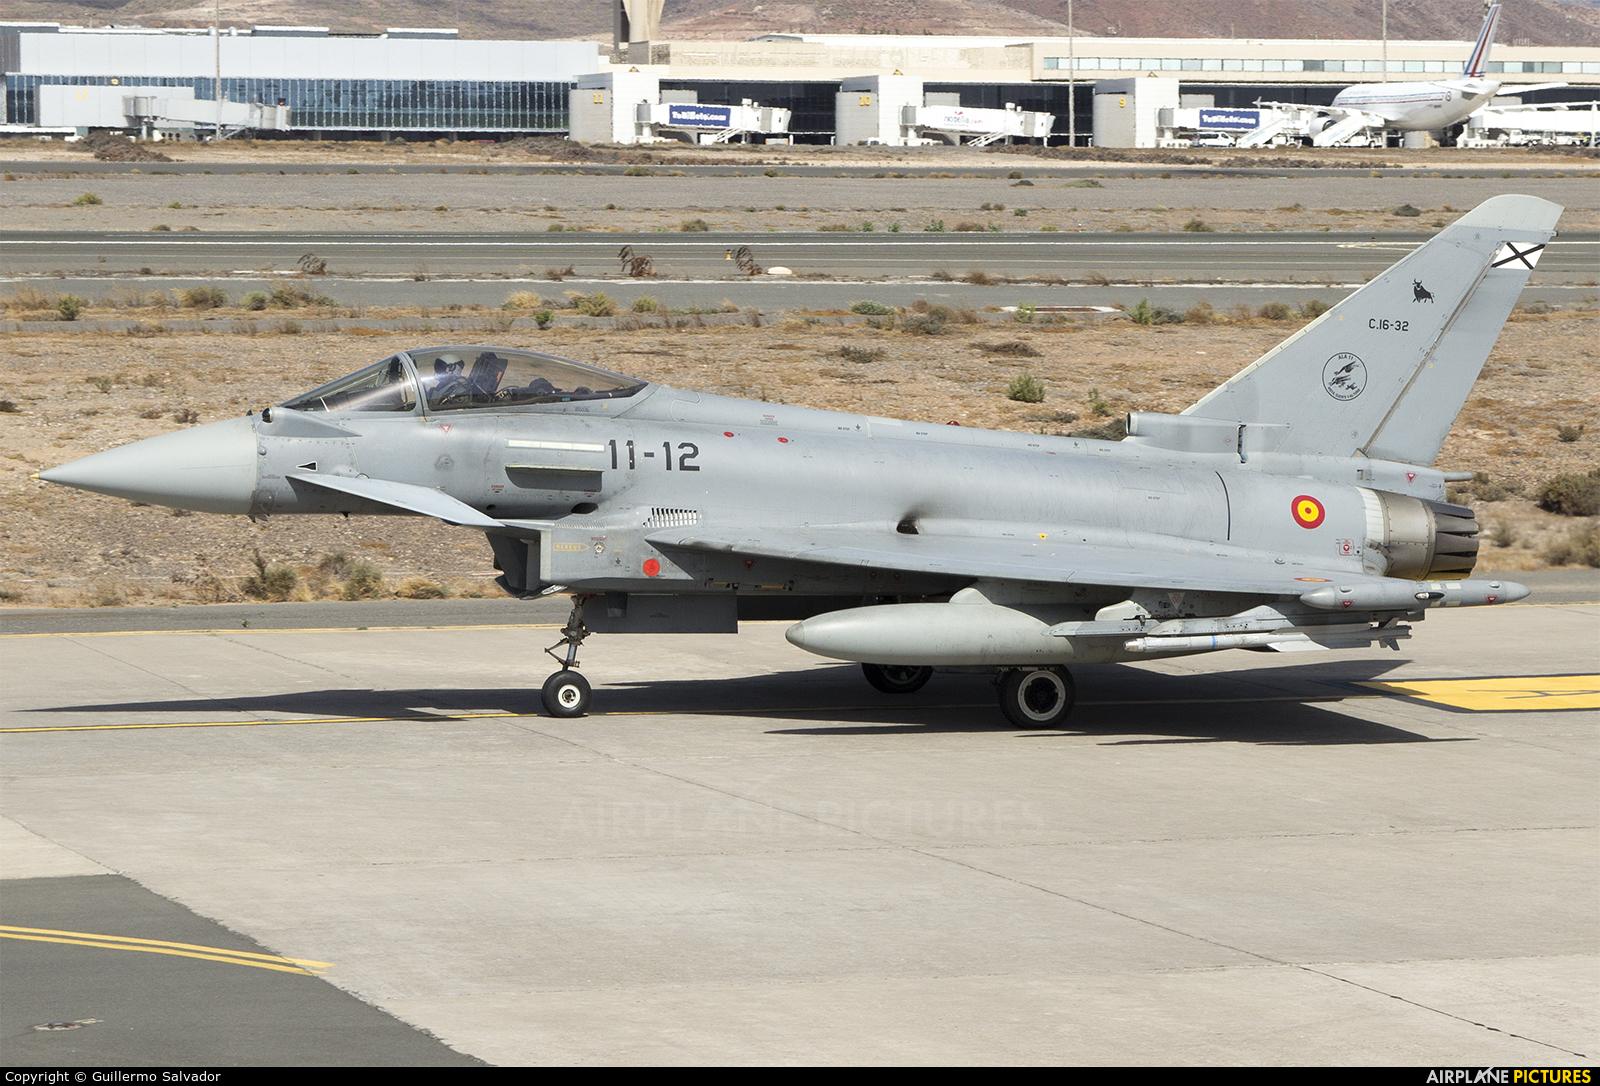 Spain - Air Force C.16-32 aircraft at Las Palmas de Gran Canaria